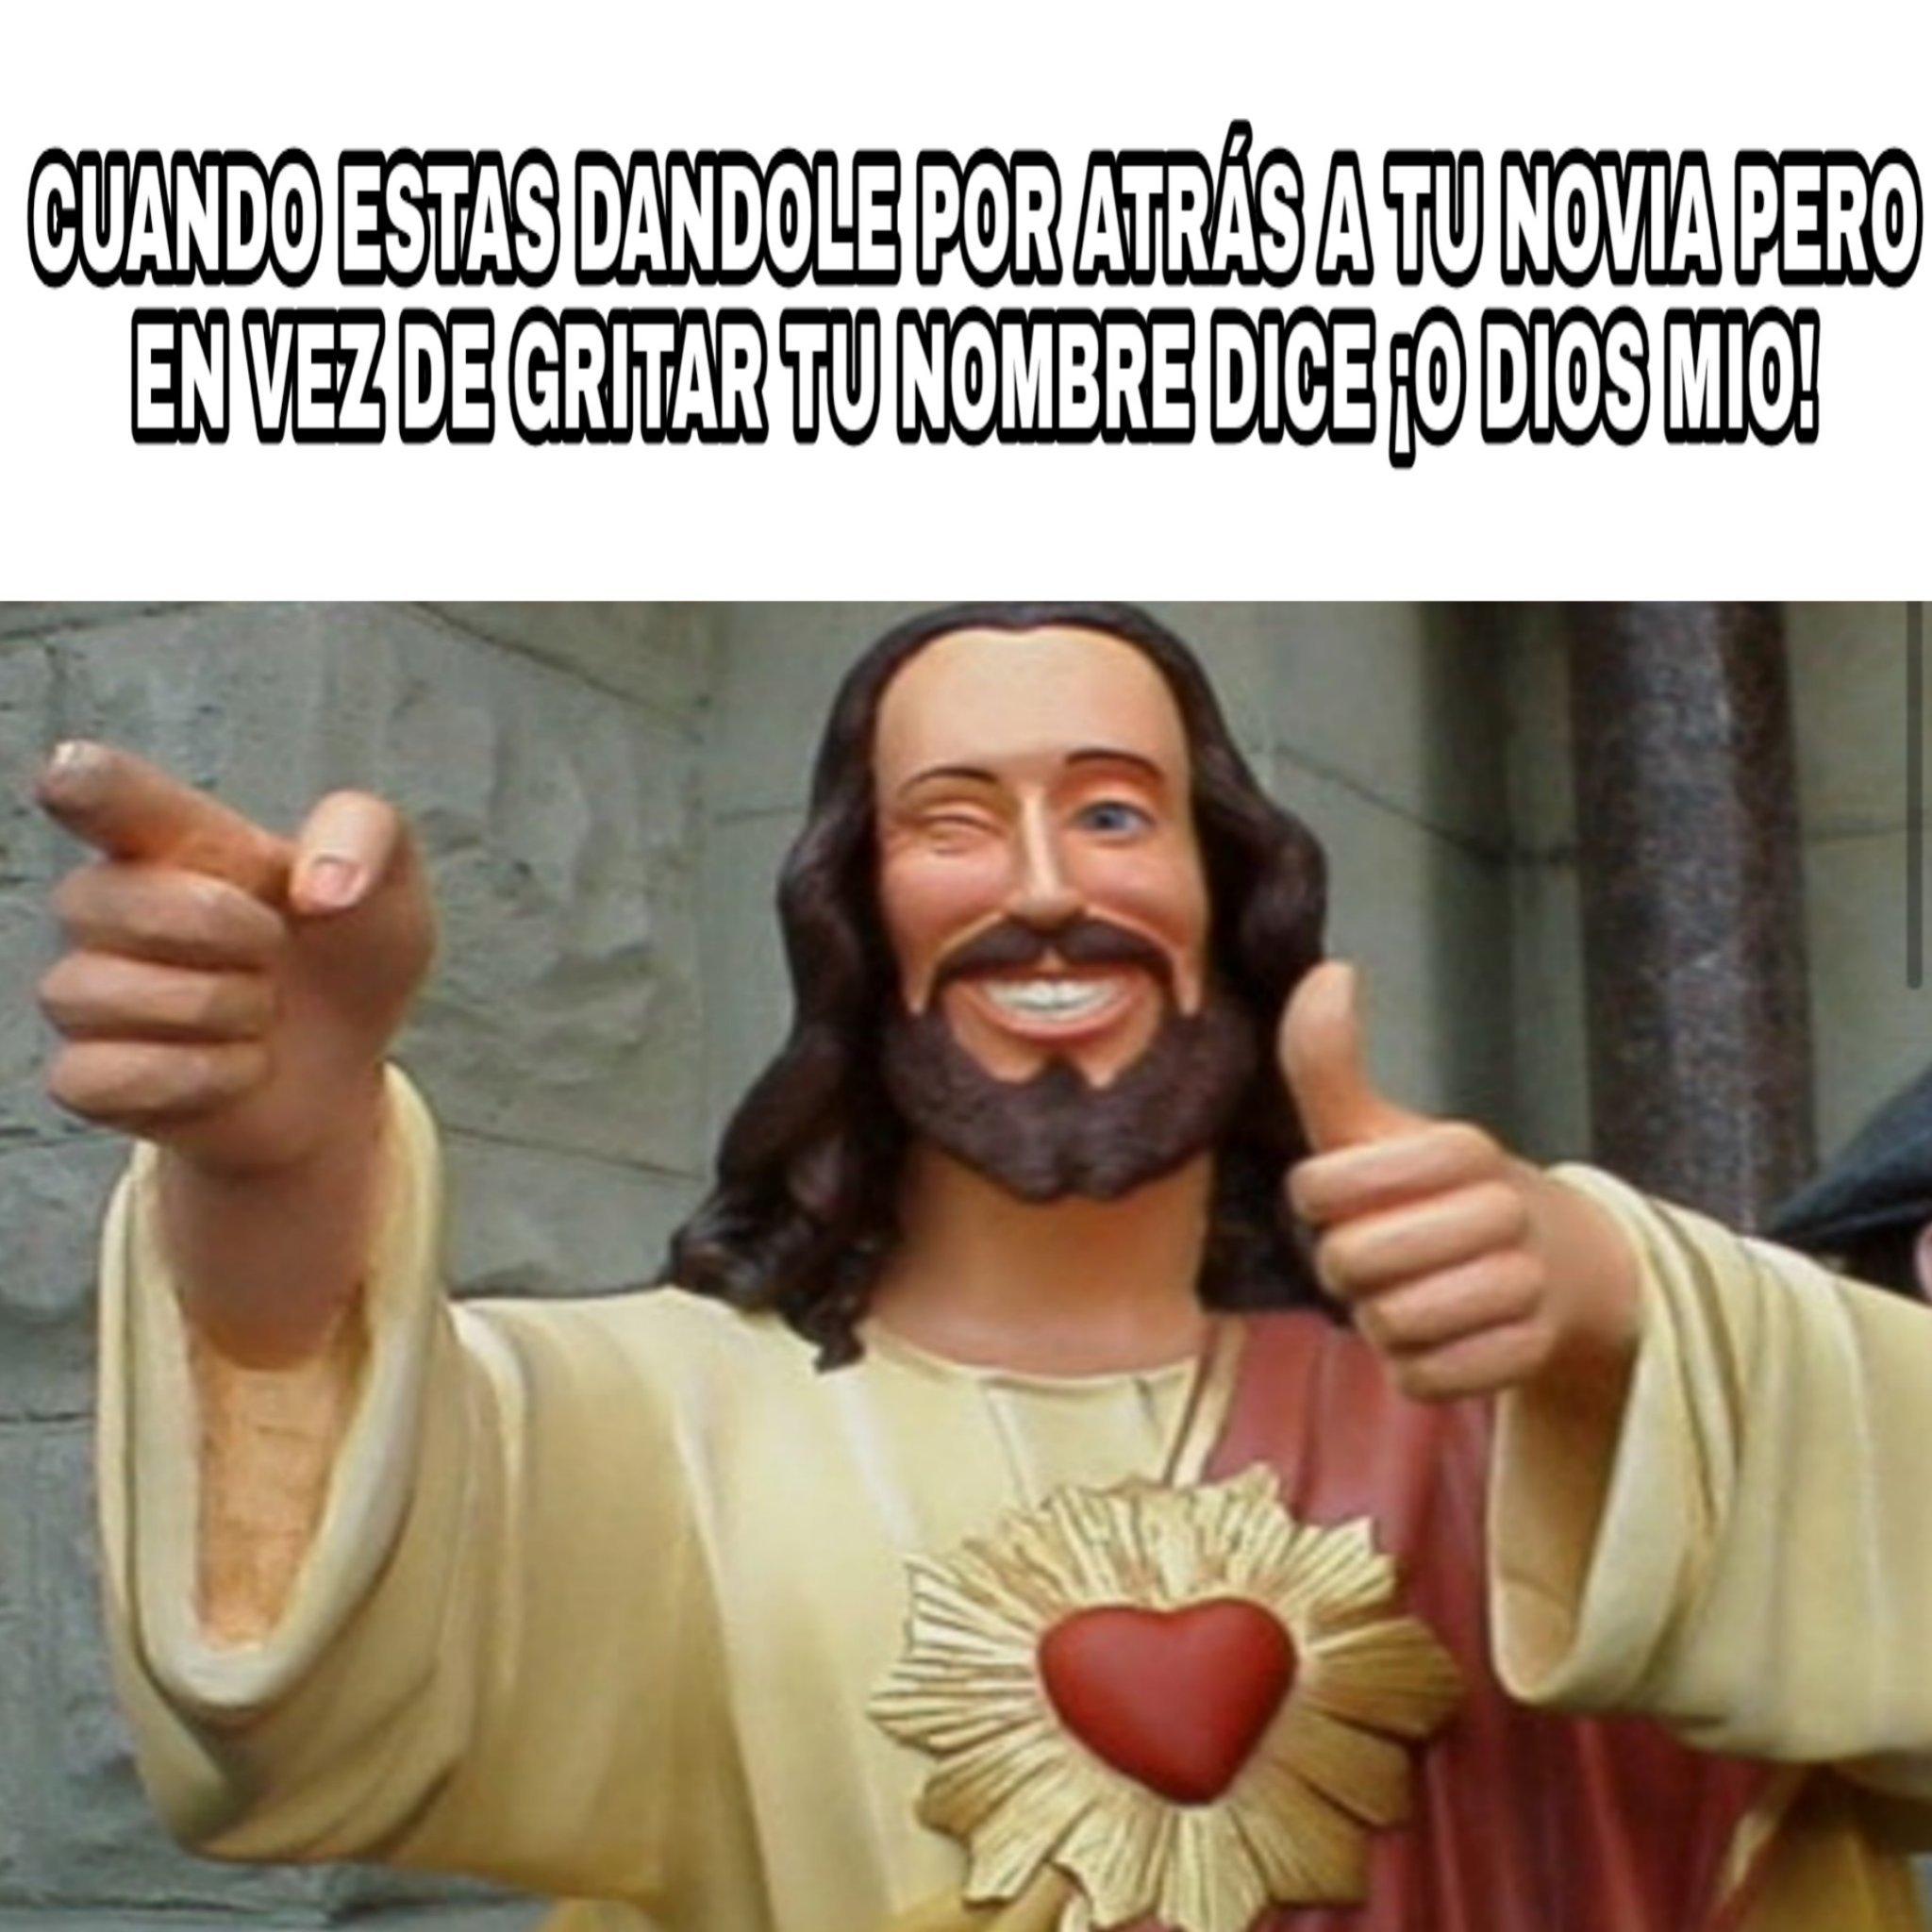 Soy cristiano cristianos no se enojen - meme